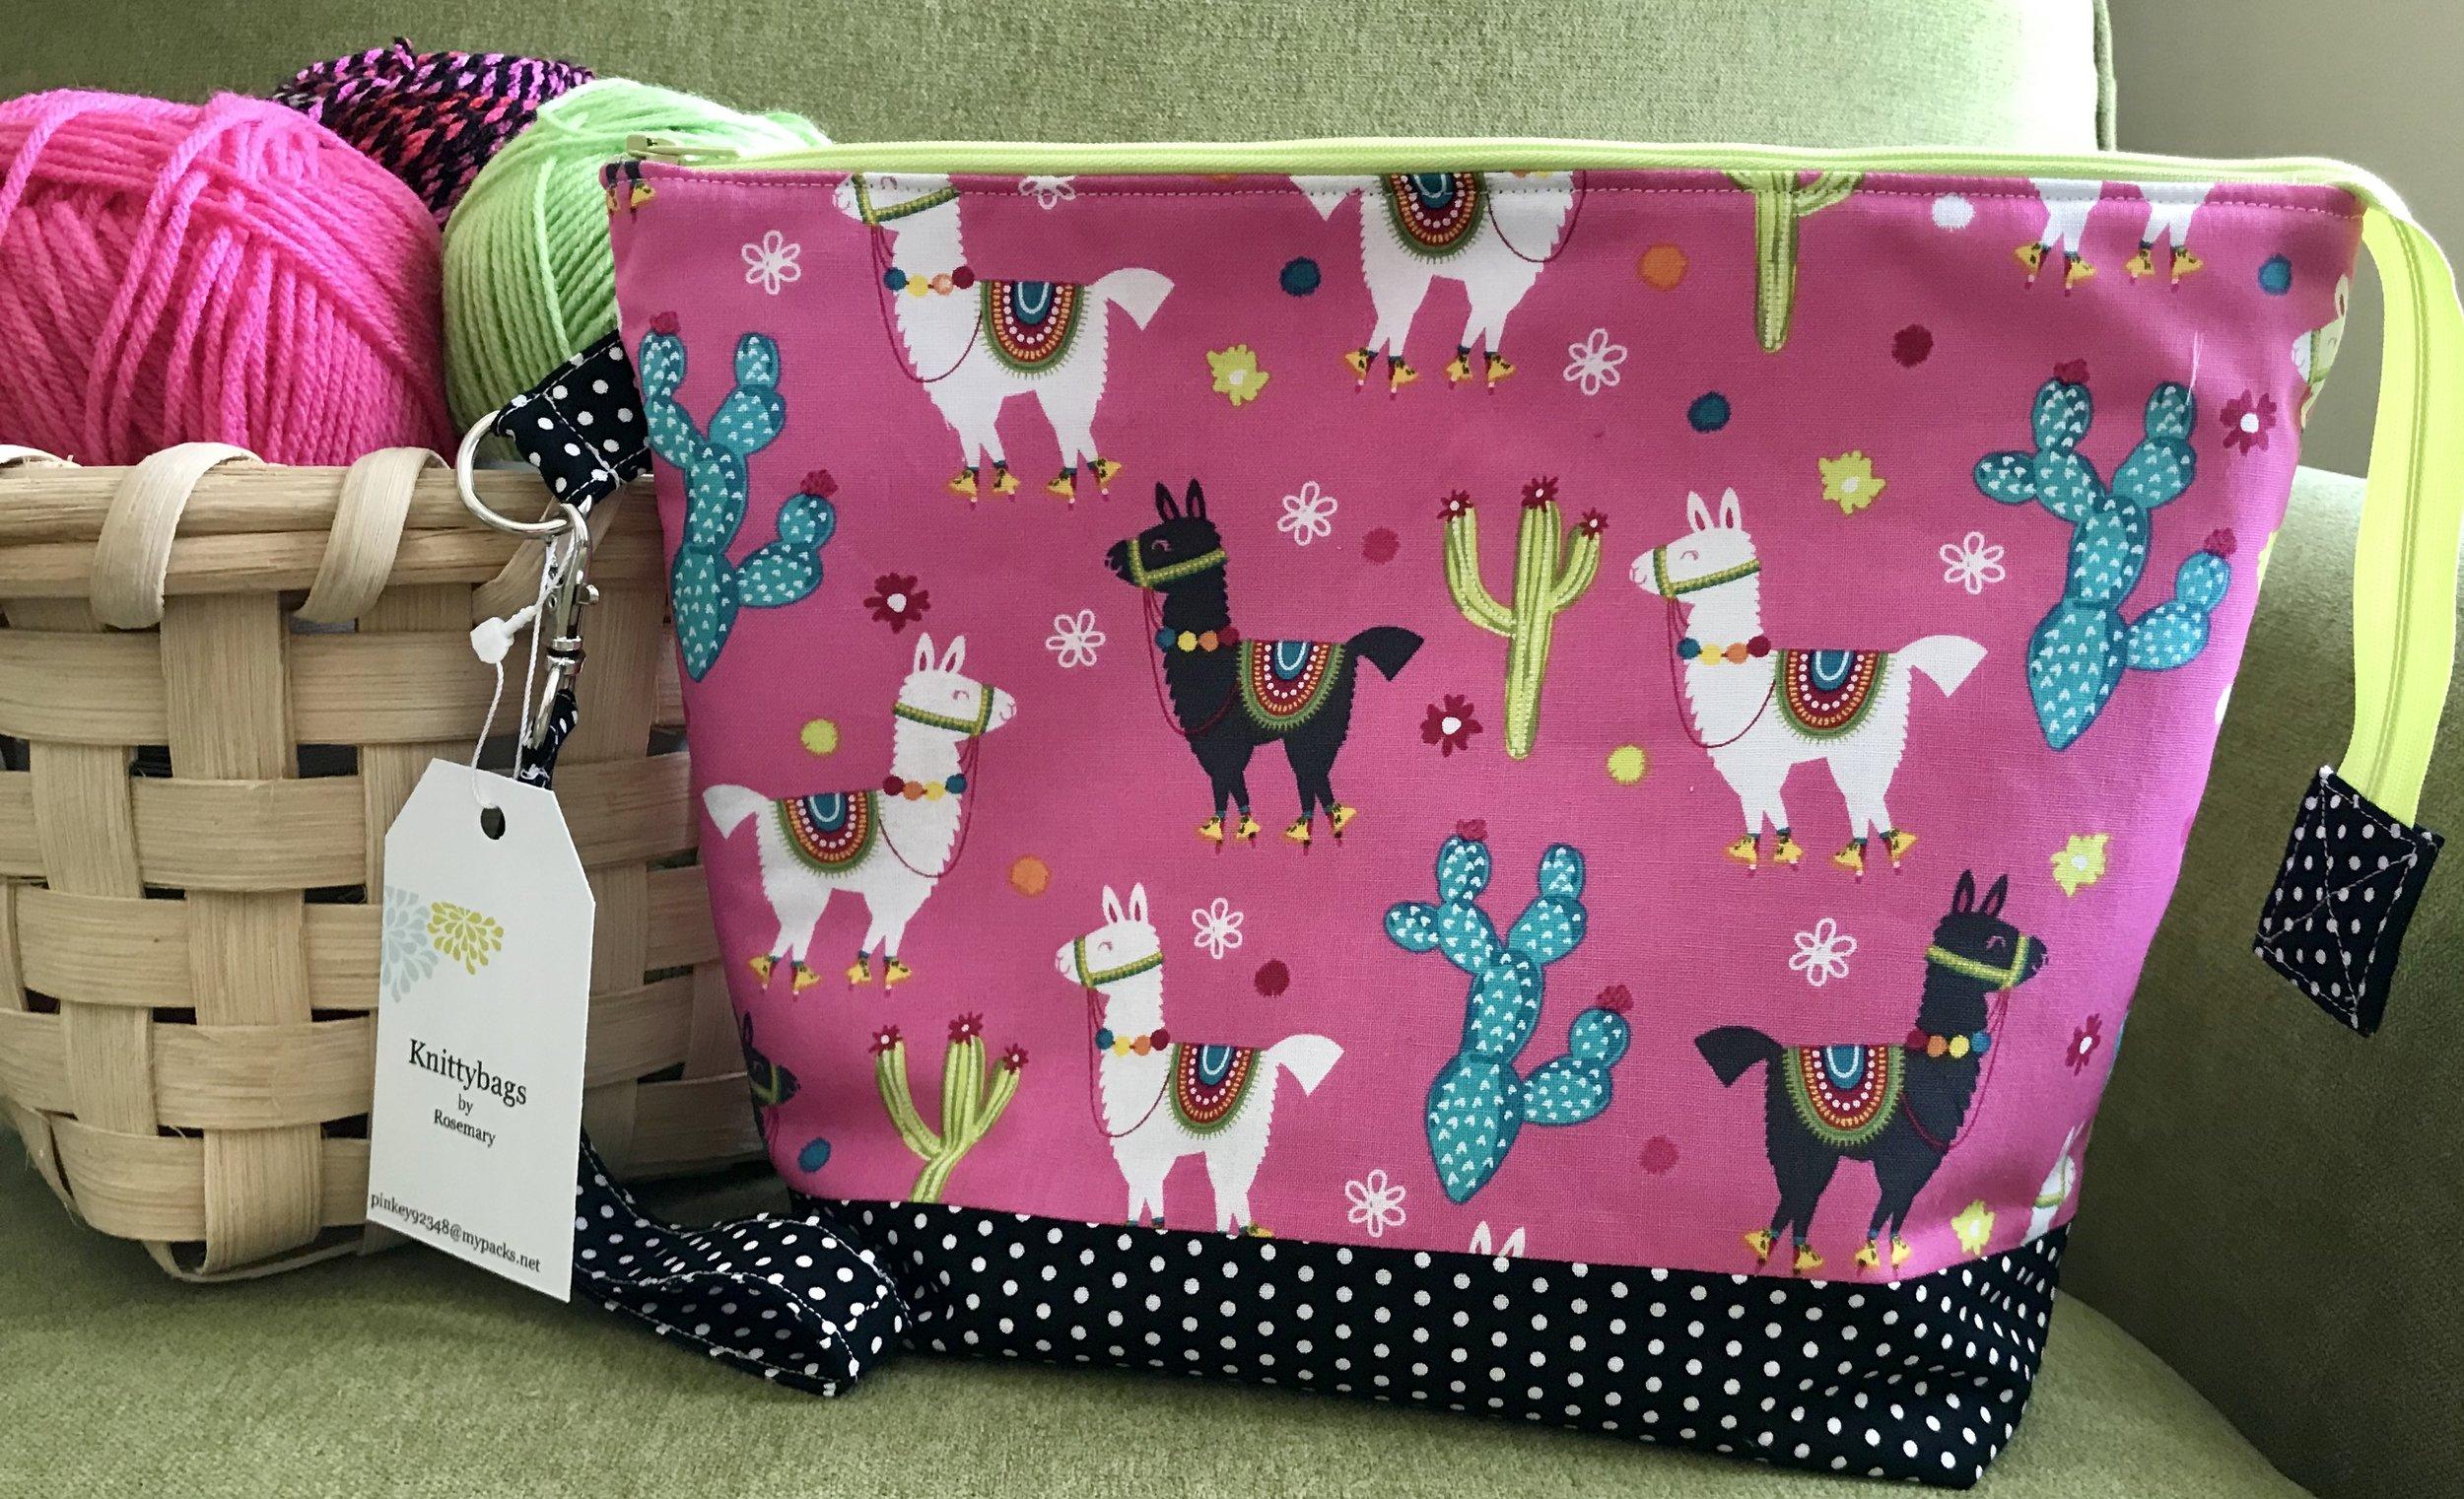 Zipper Wedge Project Bag in Fiesta Llama